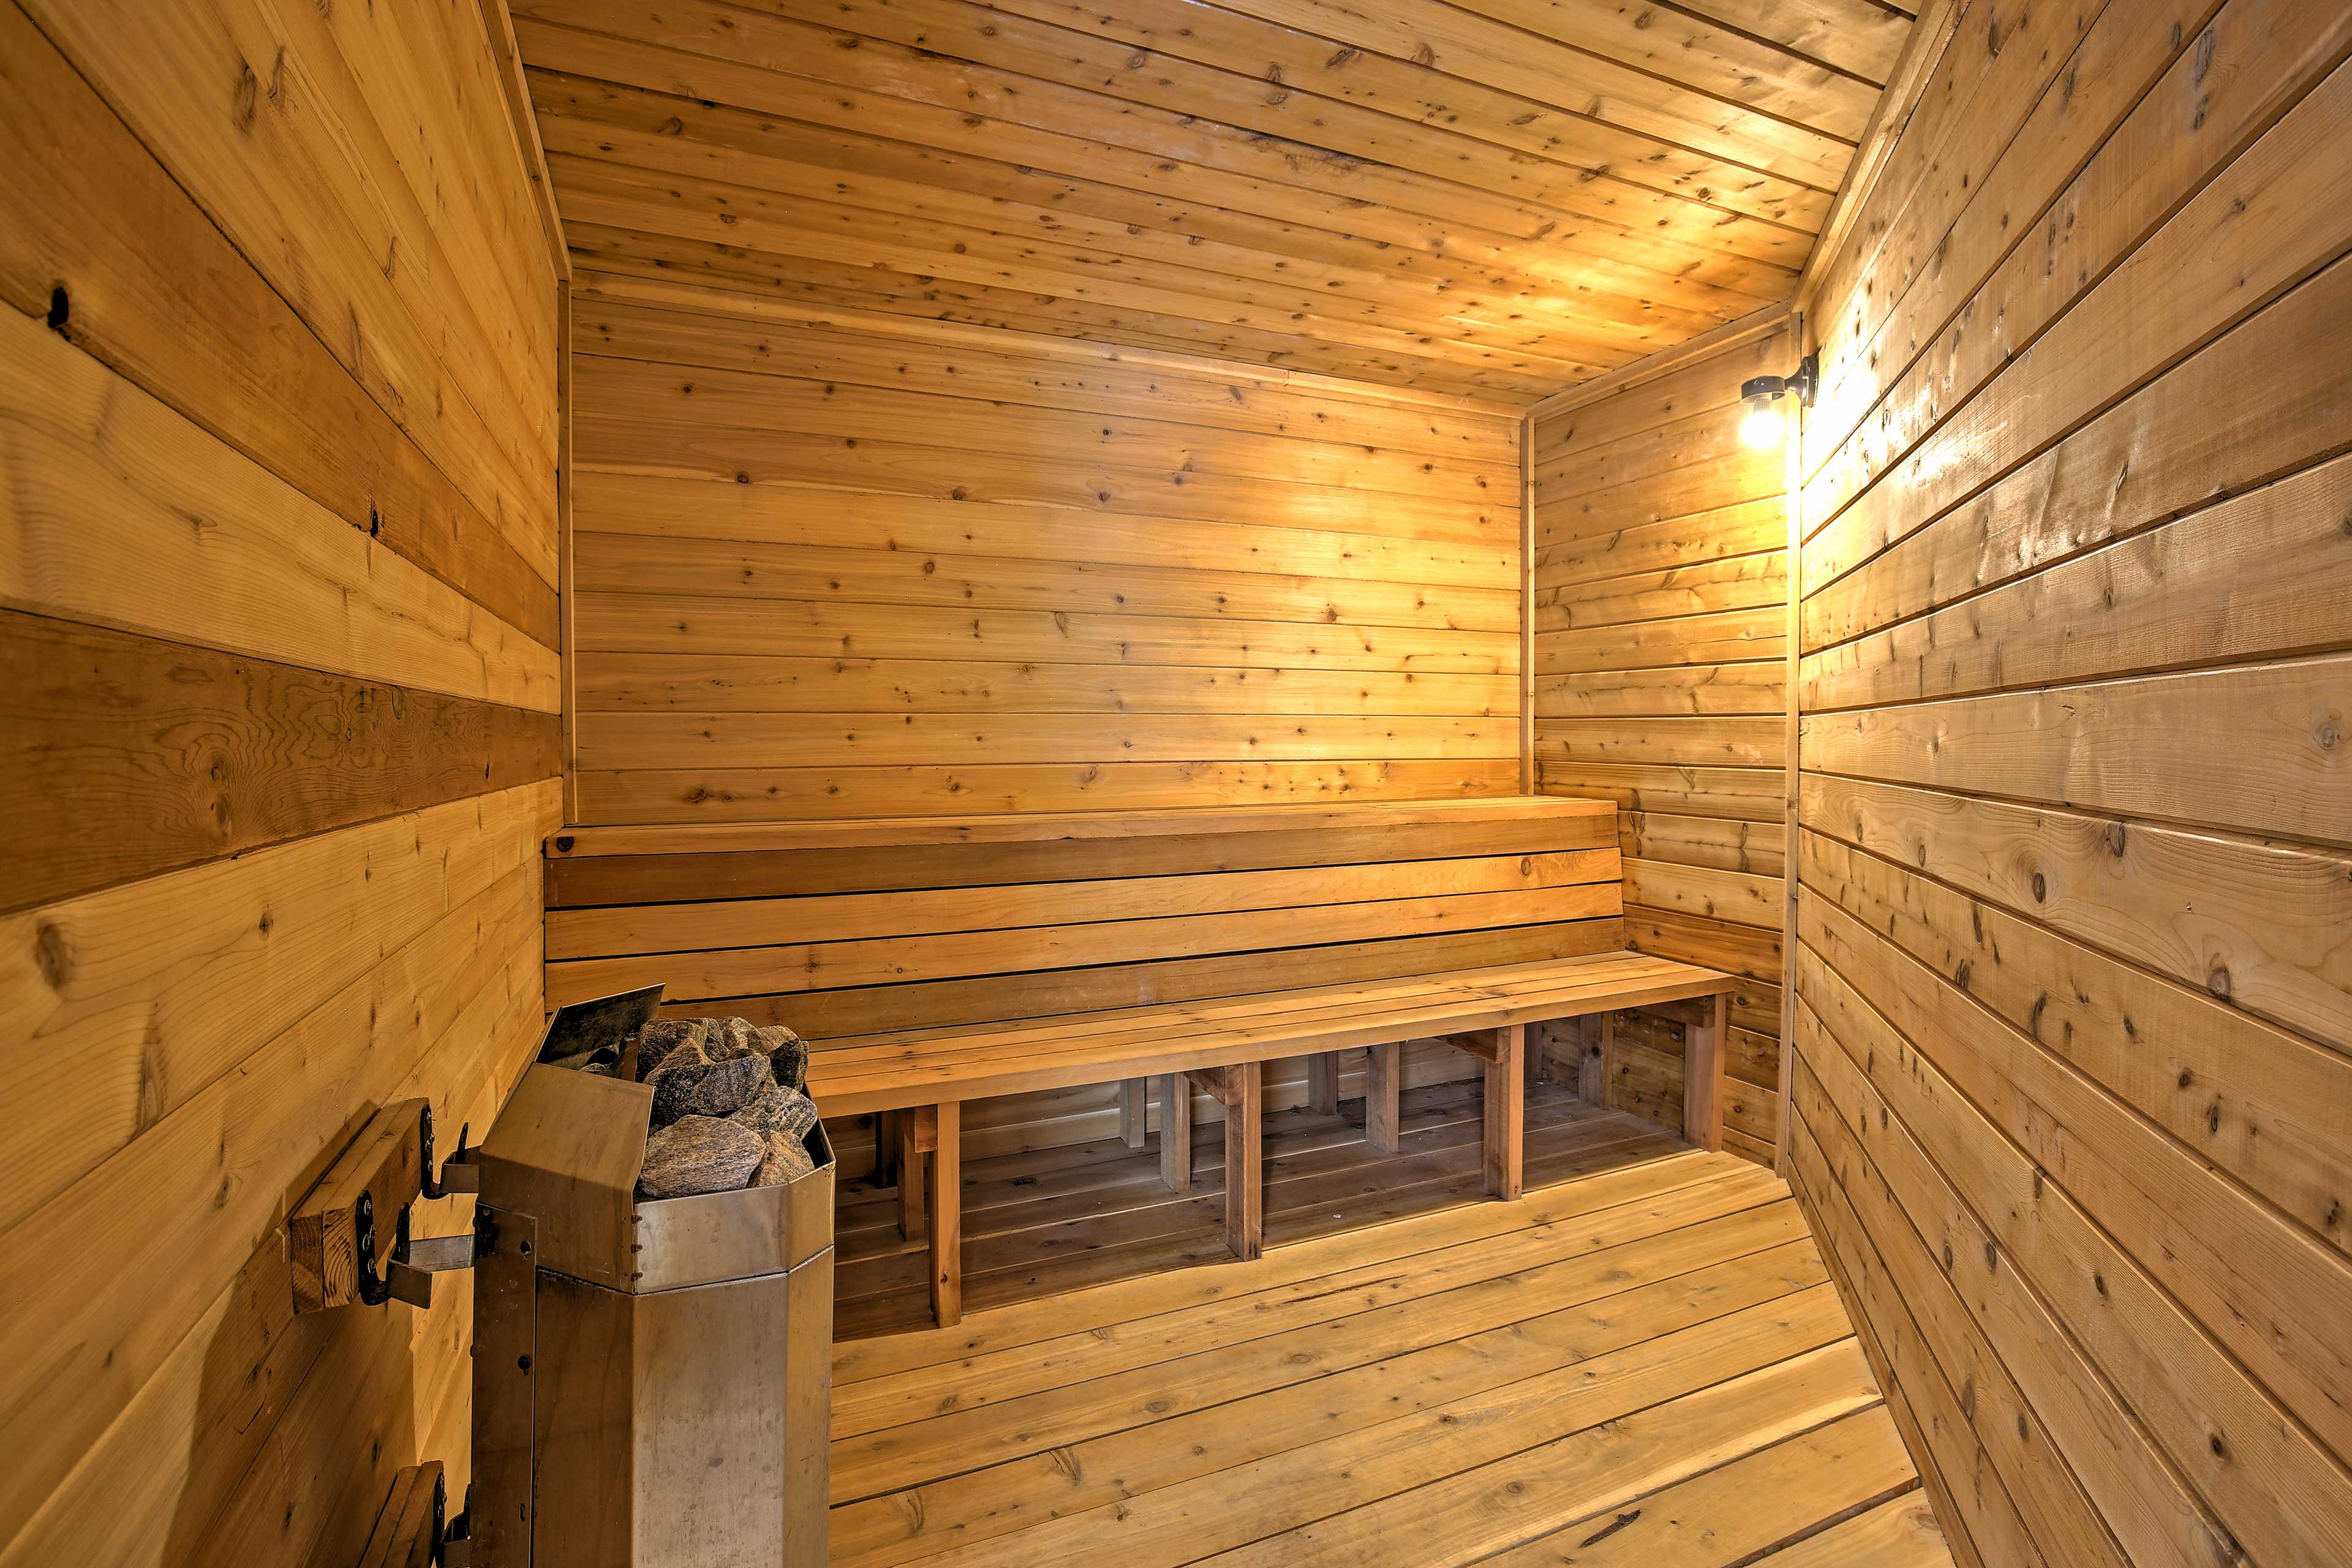 Detox in the dry sauna.